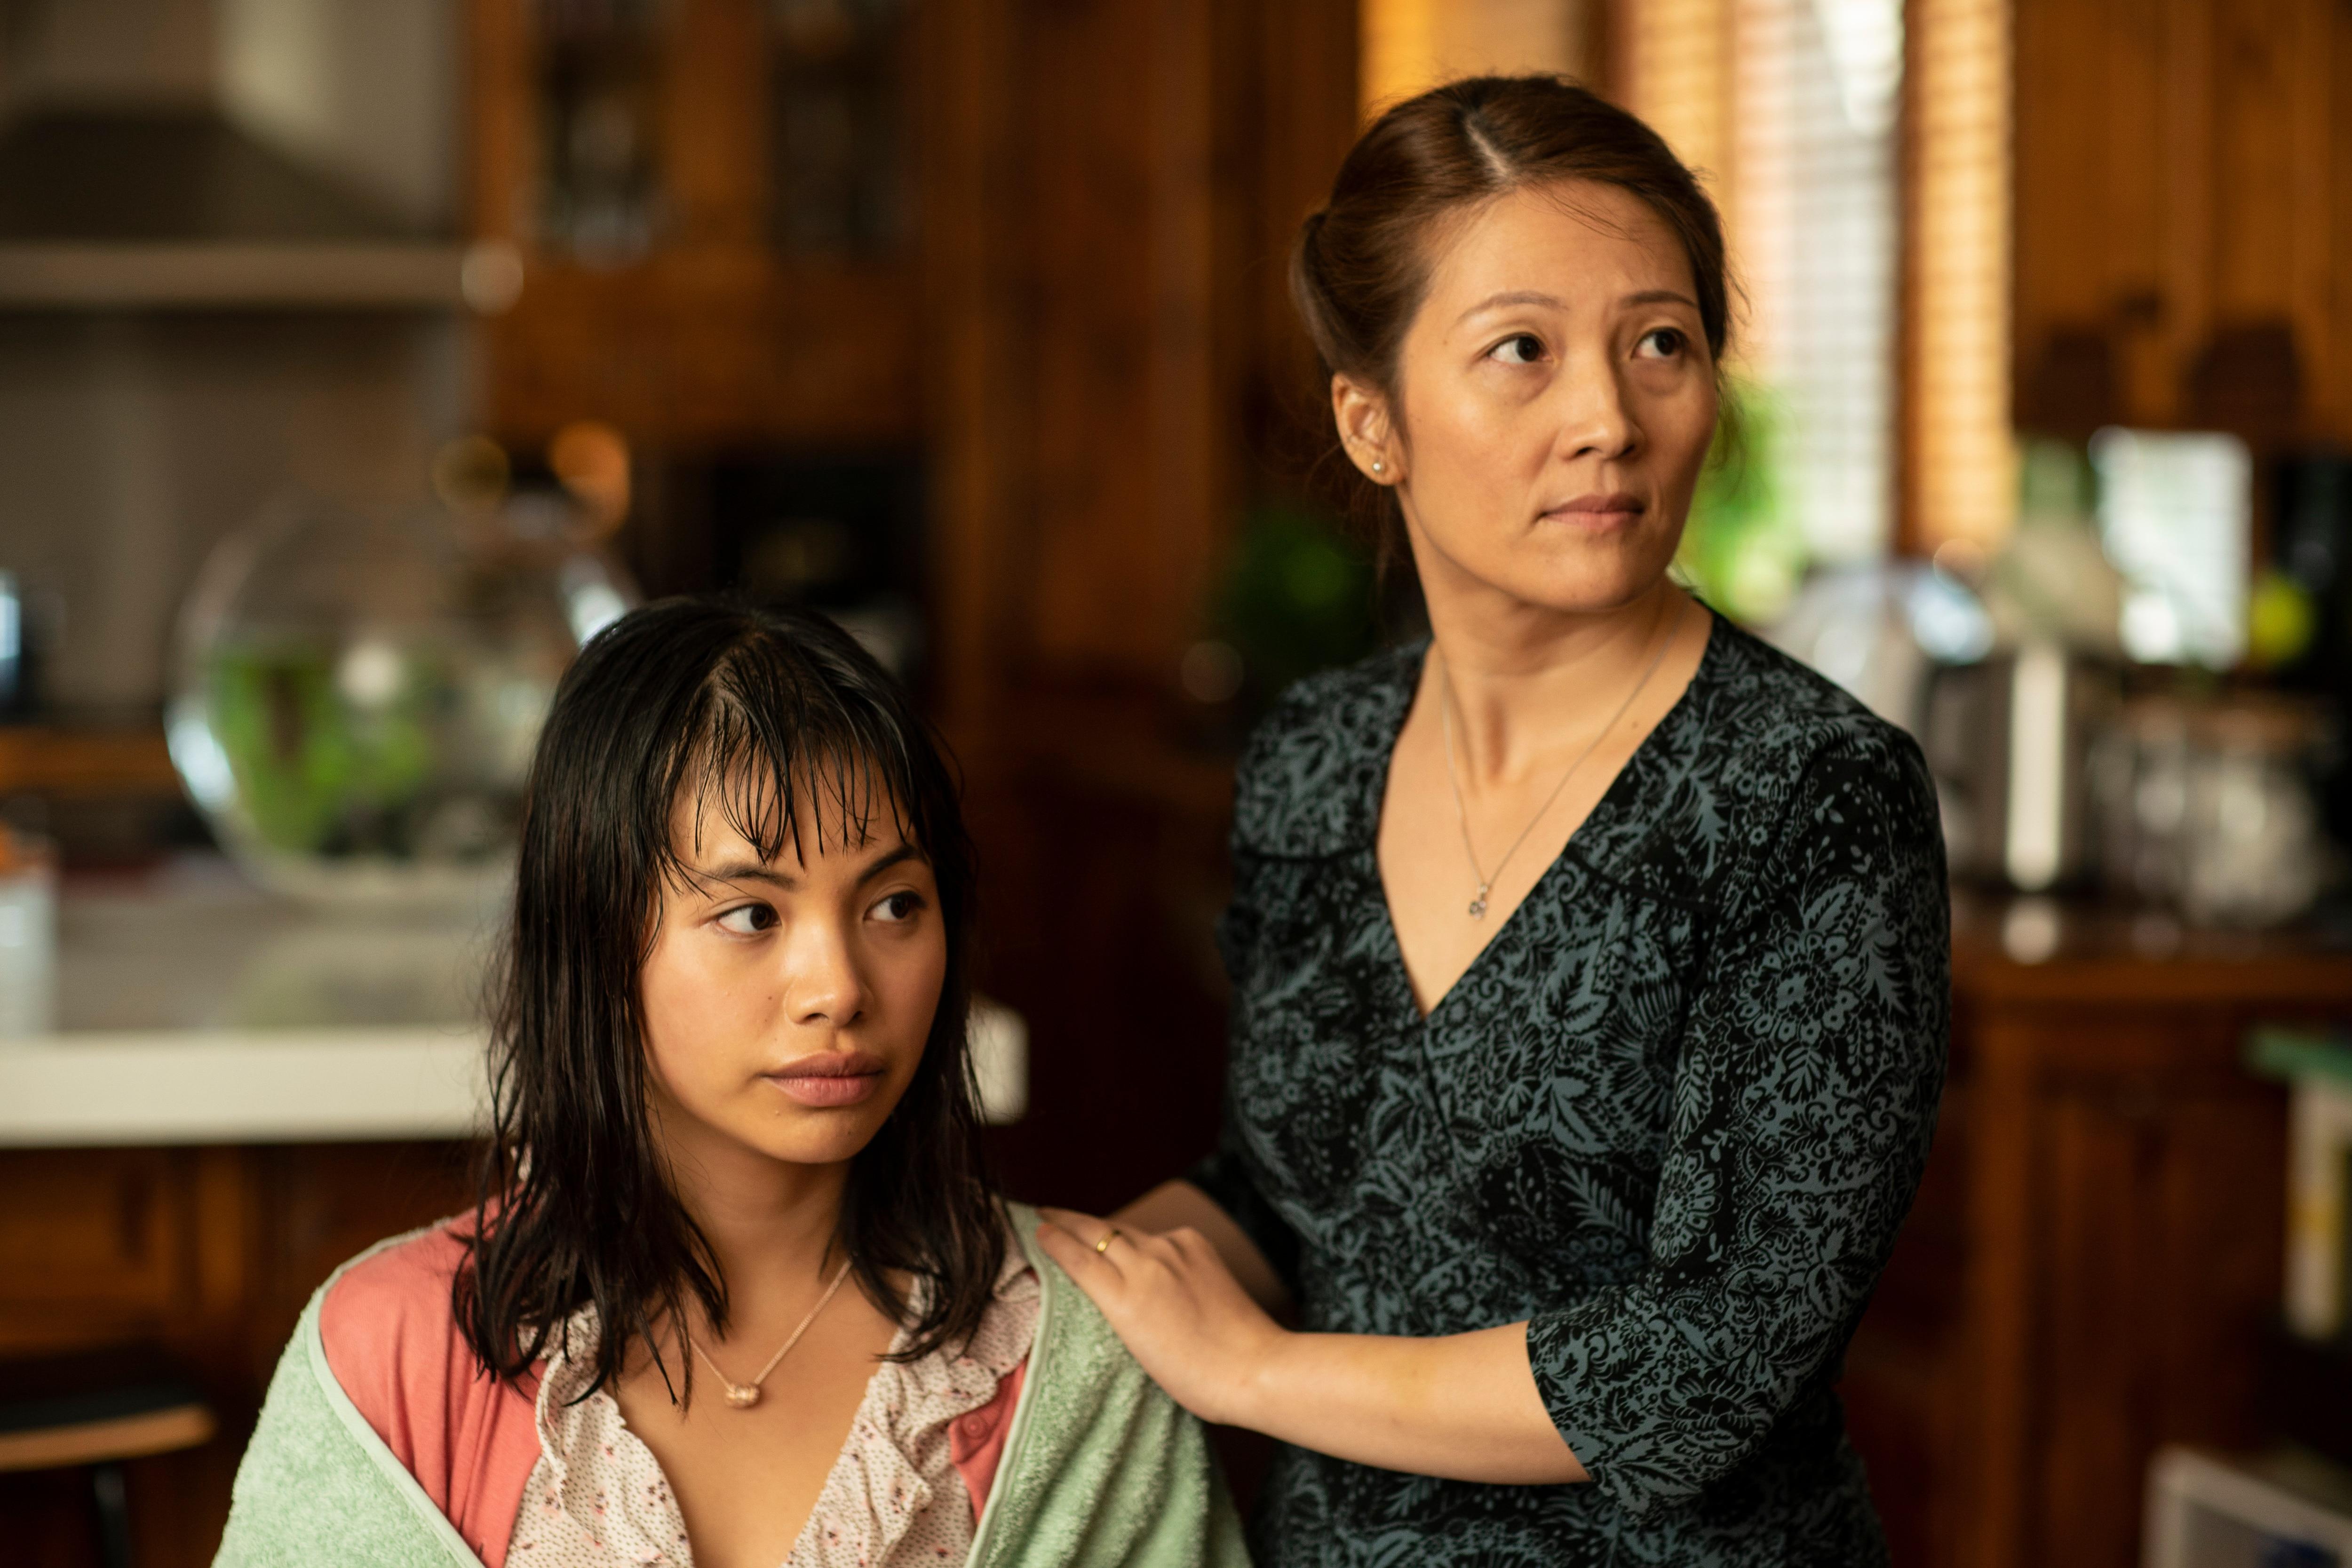 Jillian Nguyen in Hungry Ghosts, alongside her on-screen mother, played by Oakley Kwon.